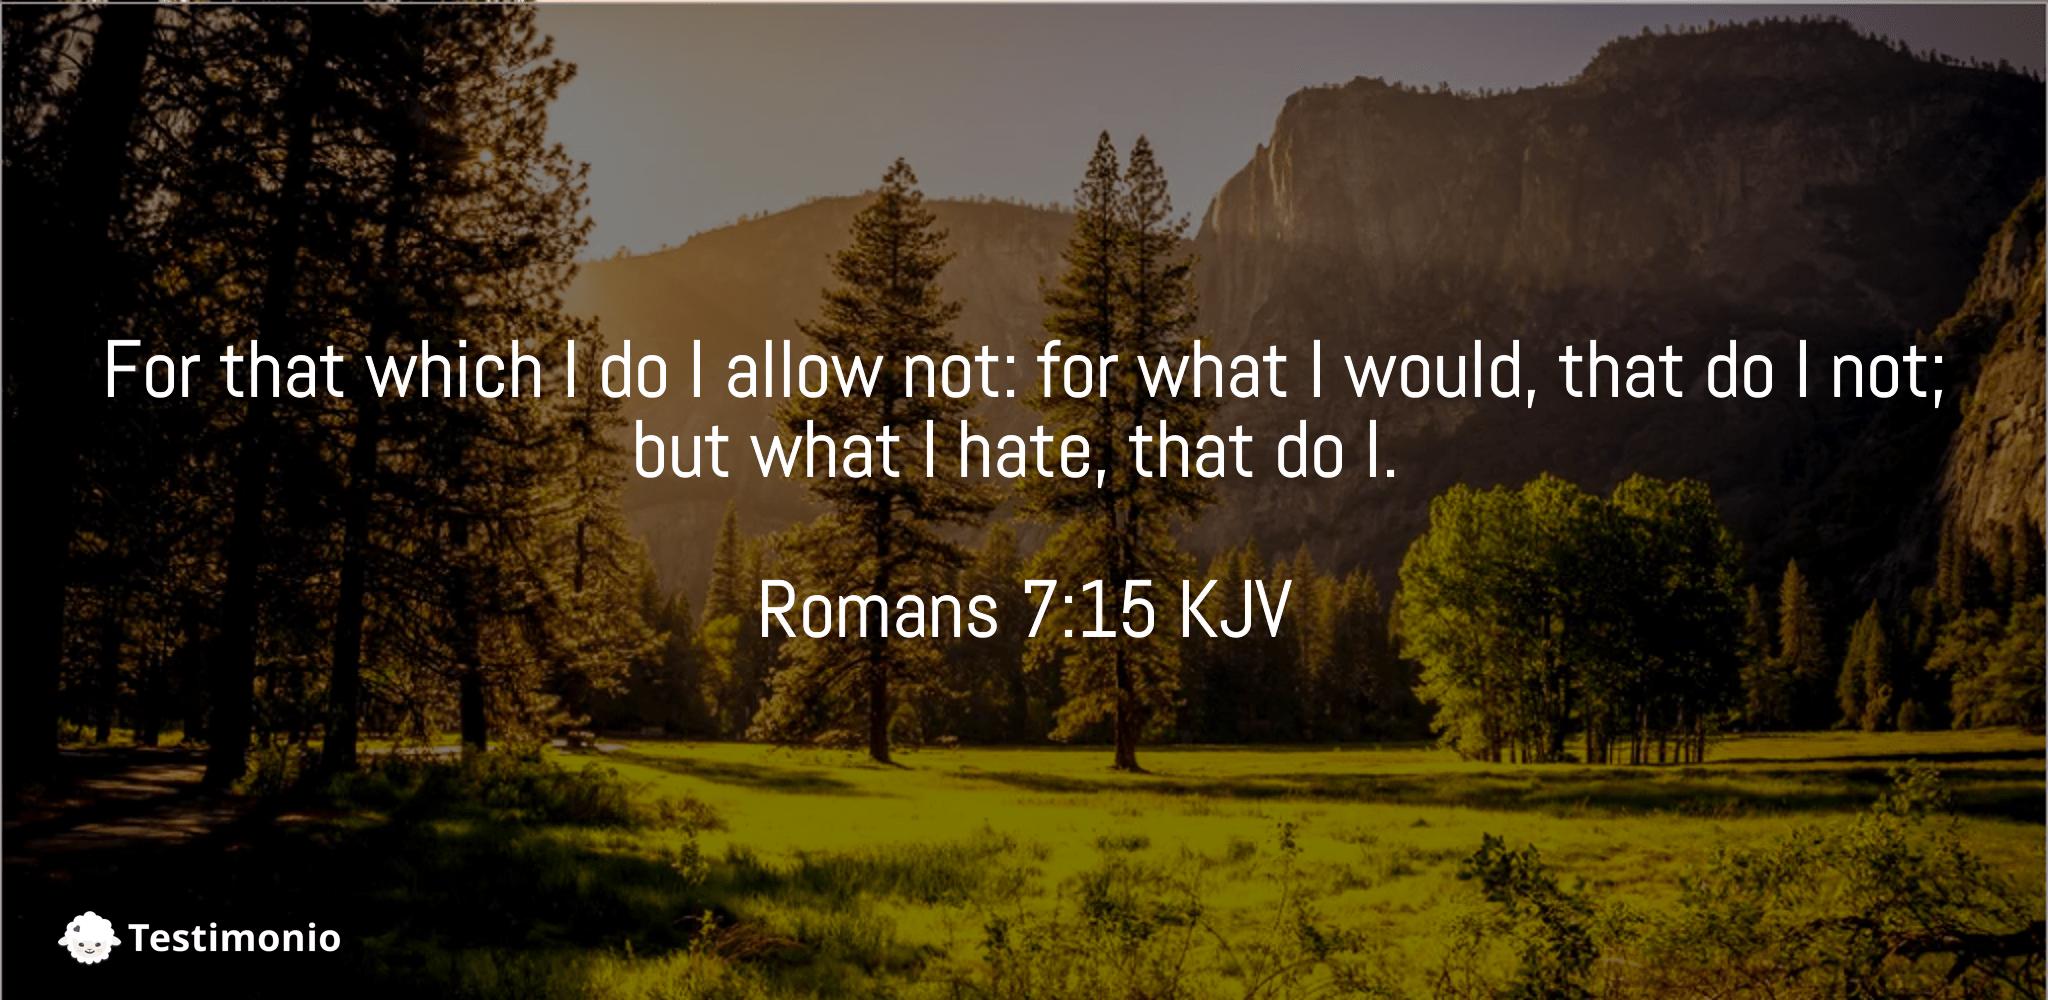 Romans 7:15